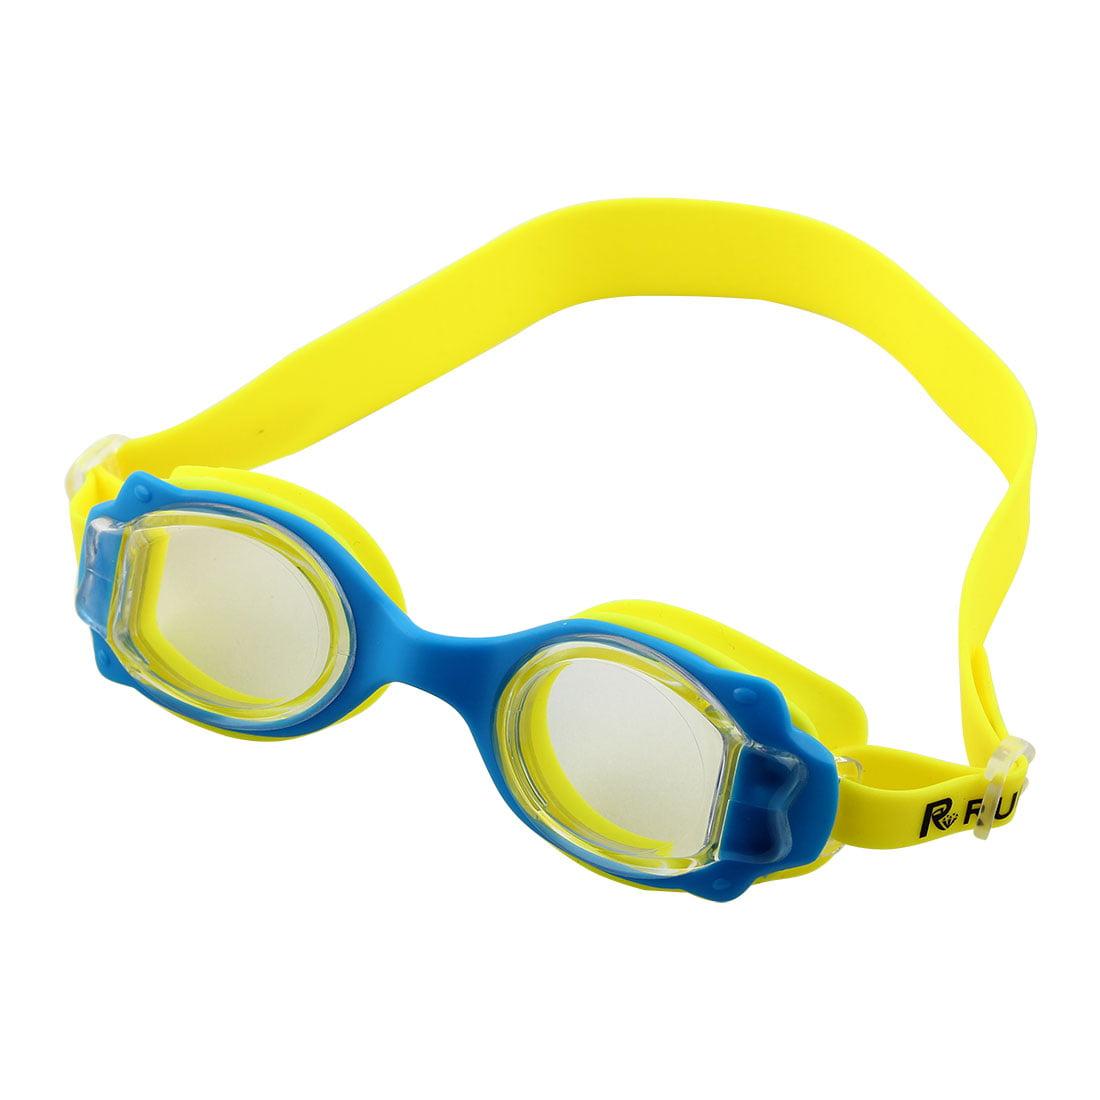 Adjustable Belt Anti Fog Swim Glasses Swimming Goggles Yellow for Kids Children by Unique-Bargains